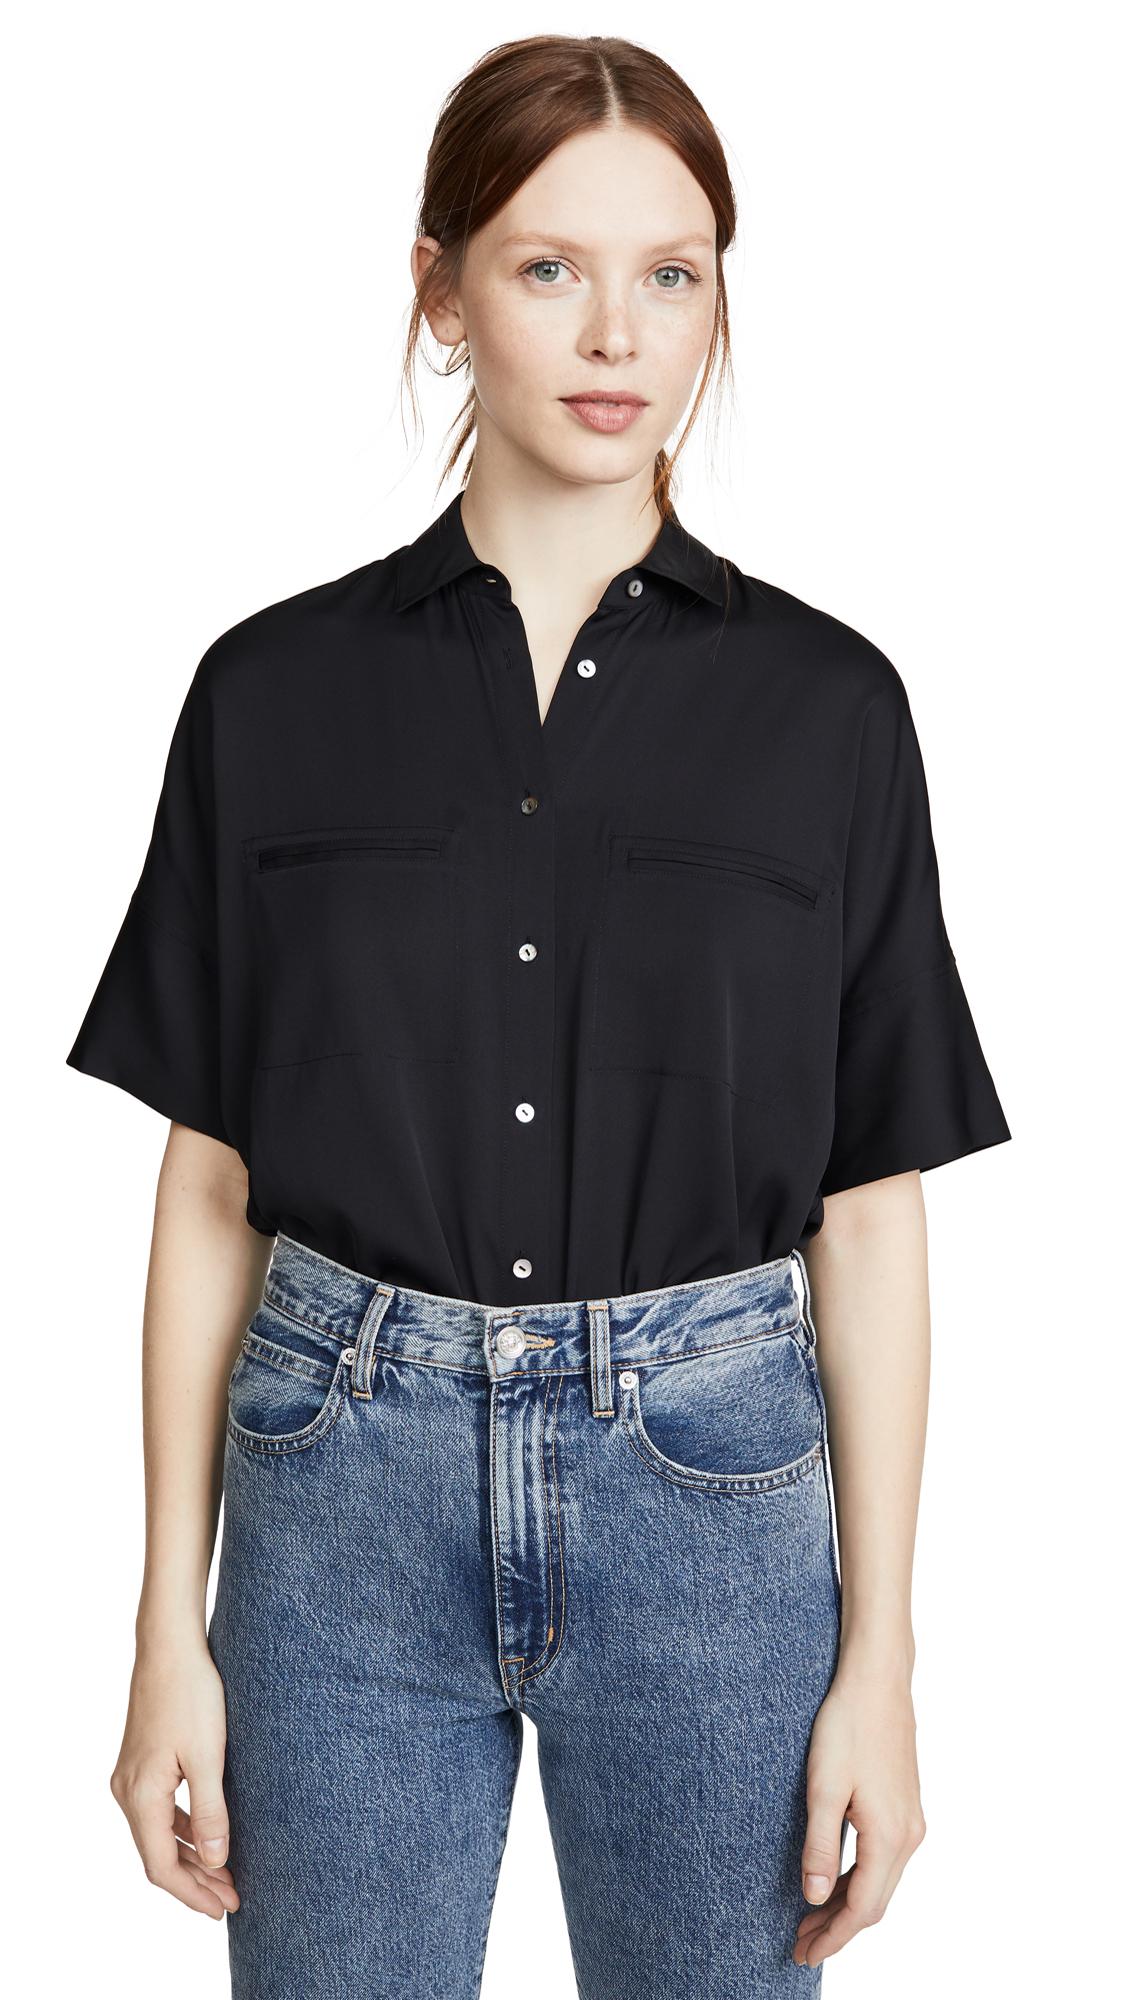 Vince Short Sleeve Blouse - 30% Off Sale